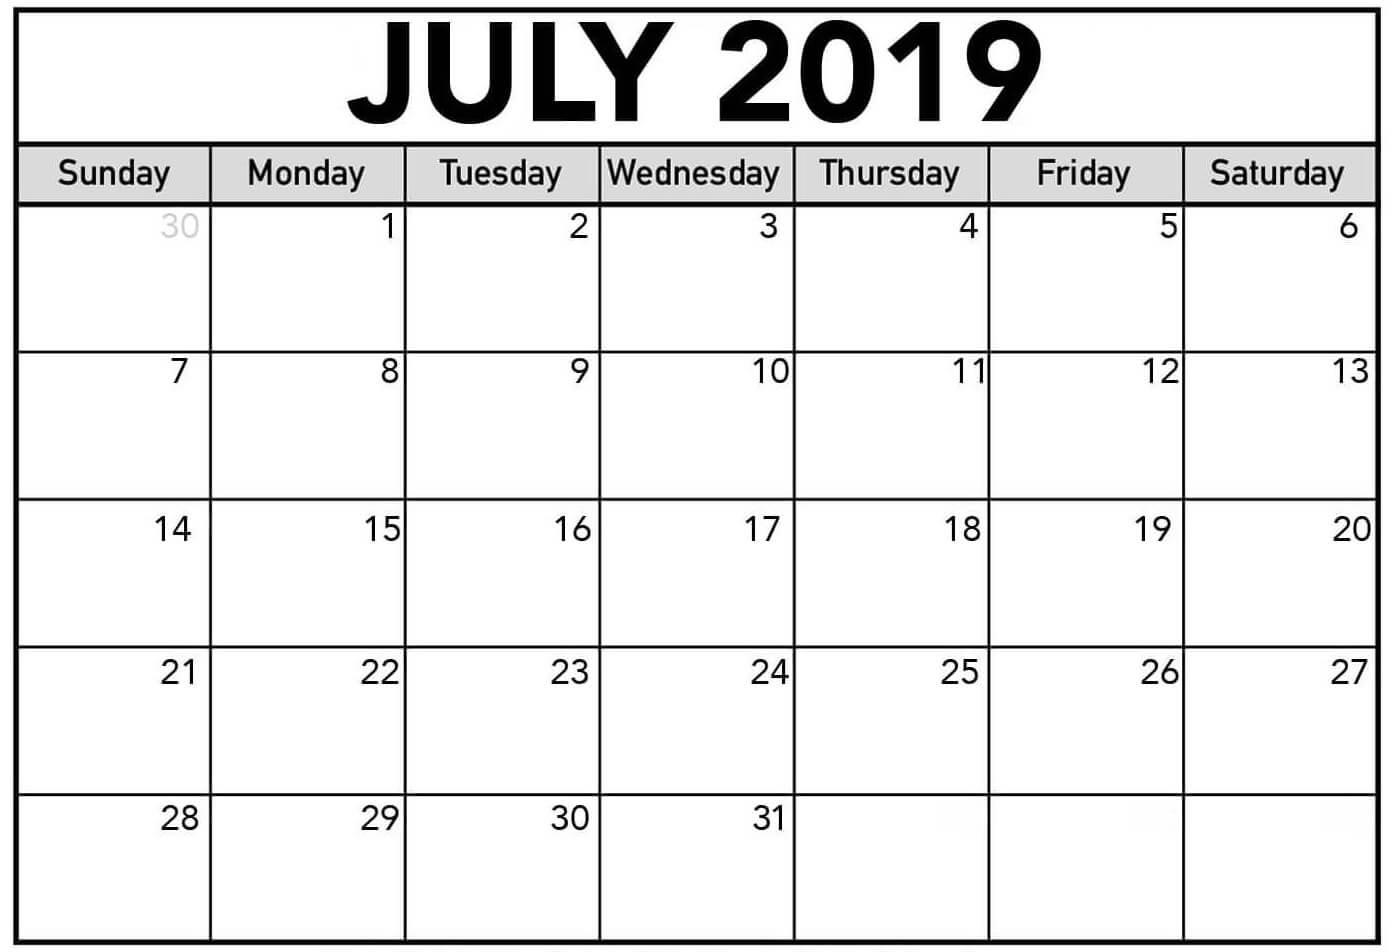 July 2019 Printable Calendar Word